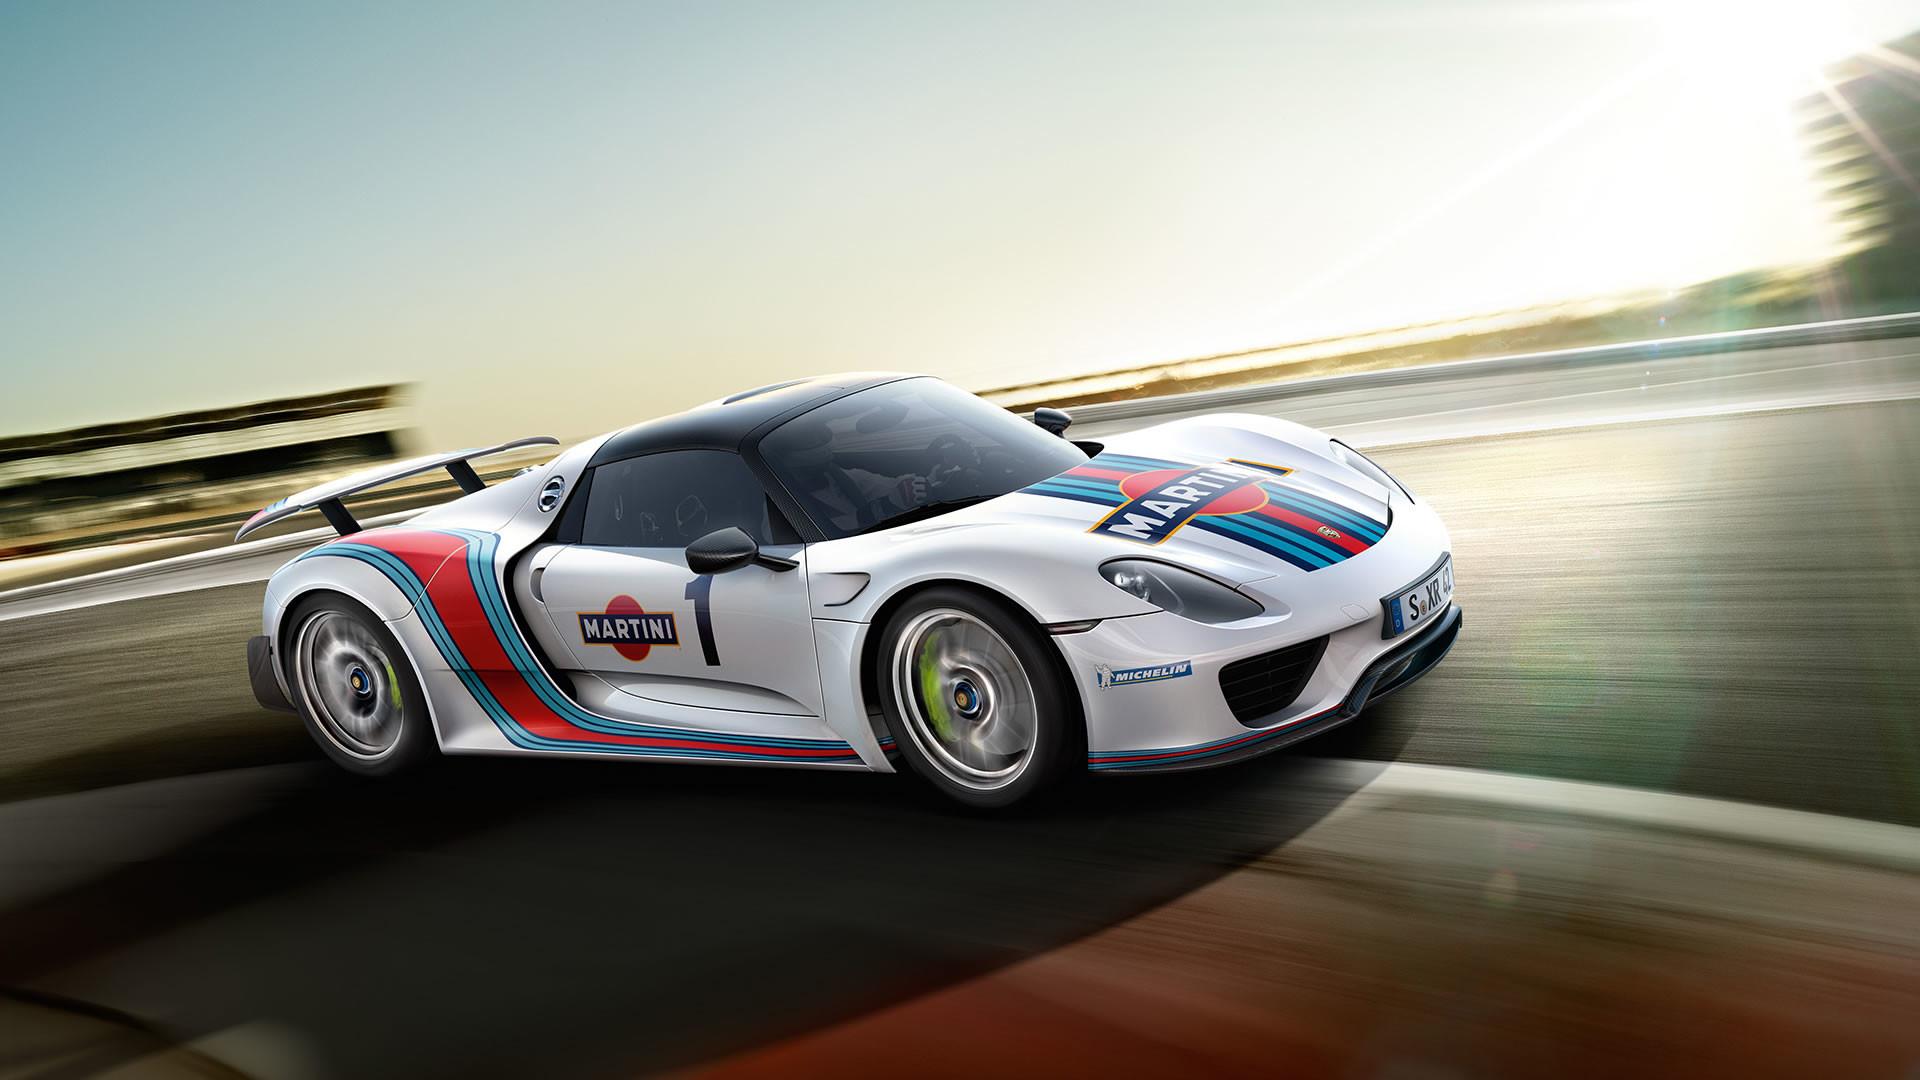 1920x1080 Porsche 918 Wallpaper Martini